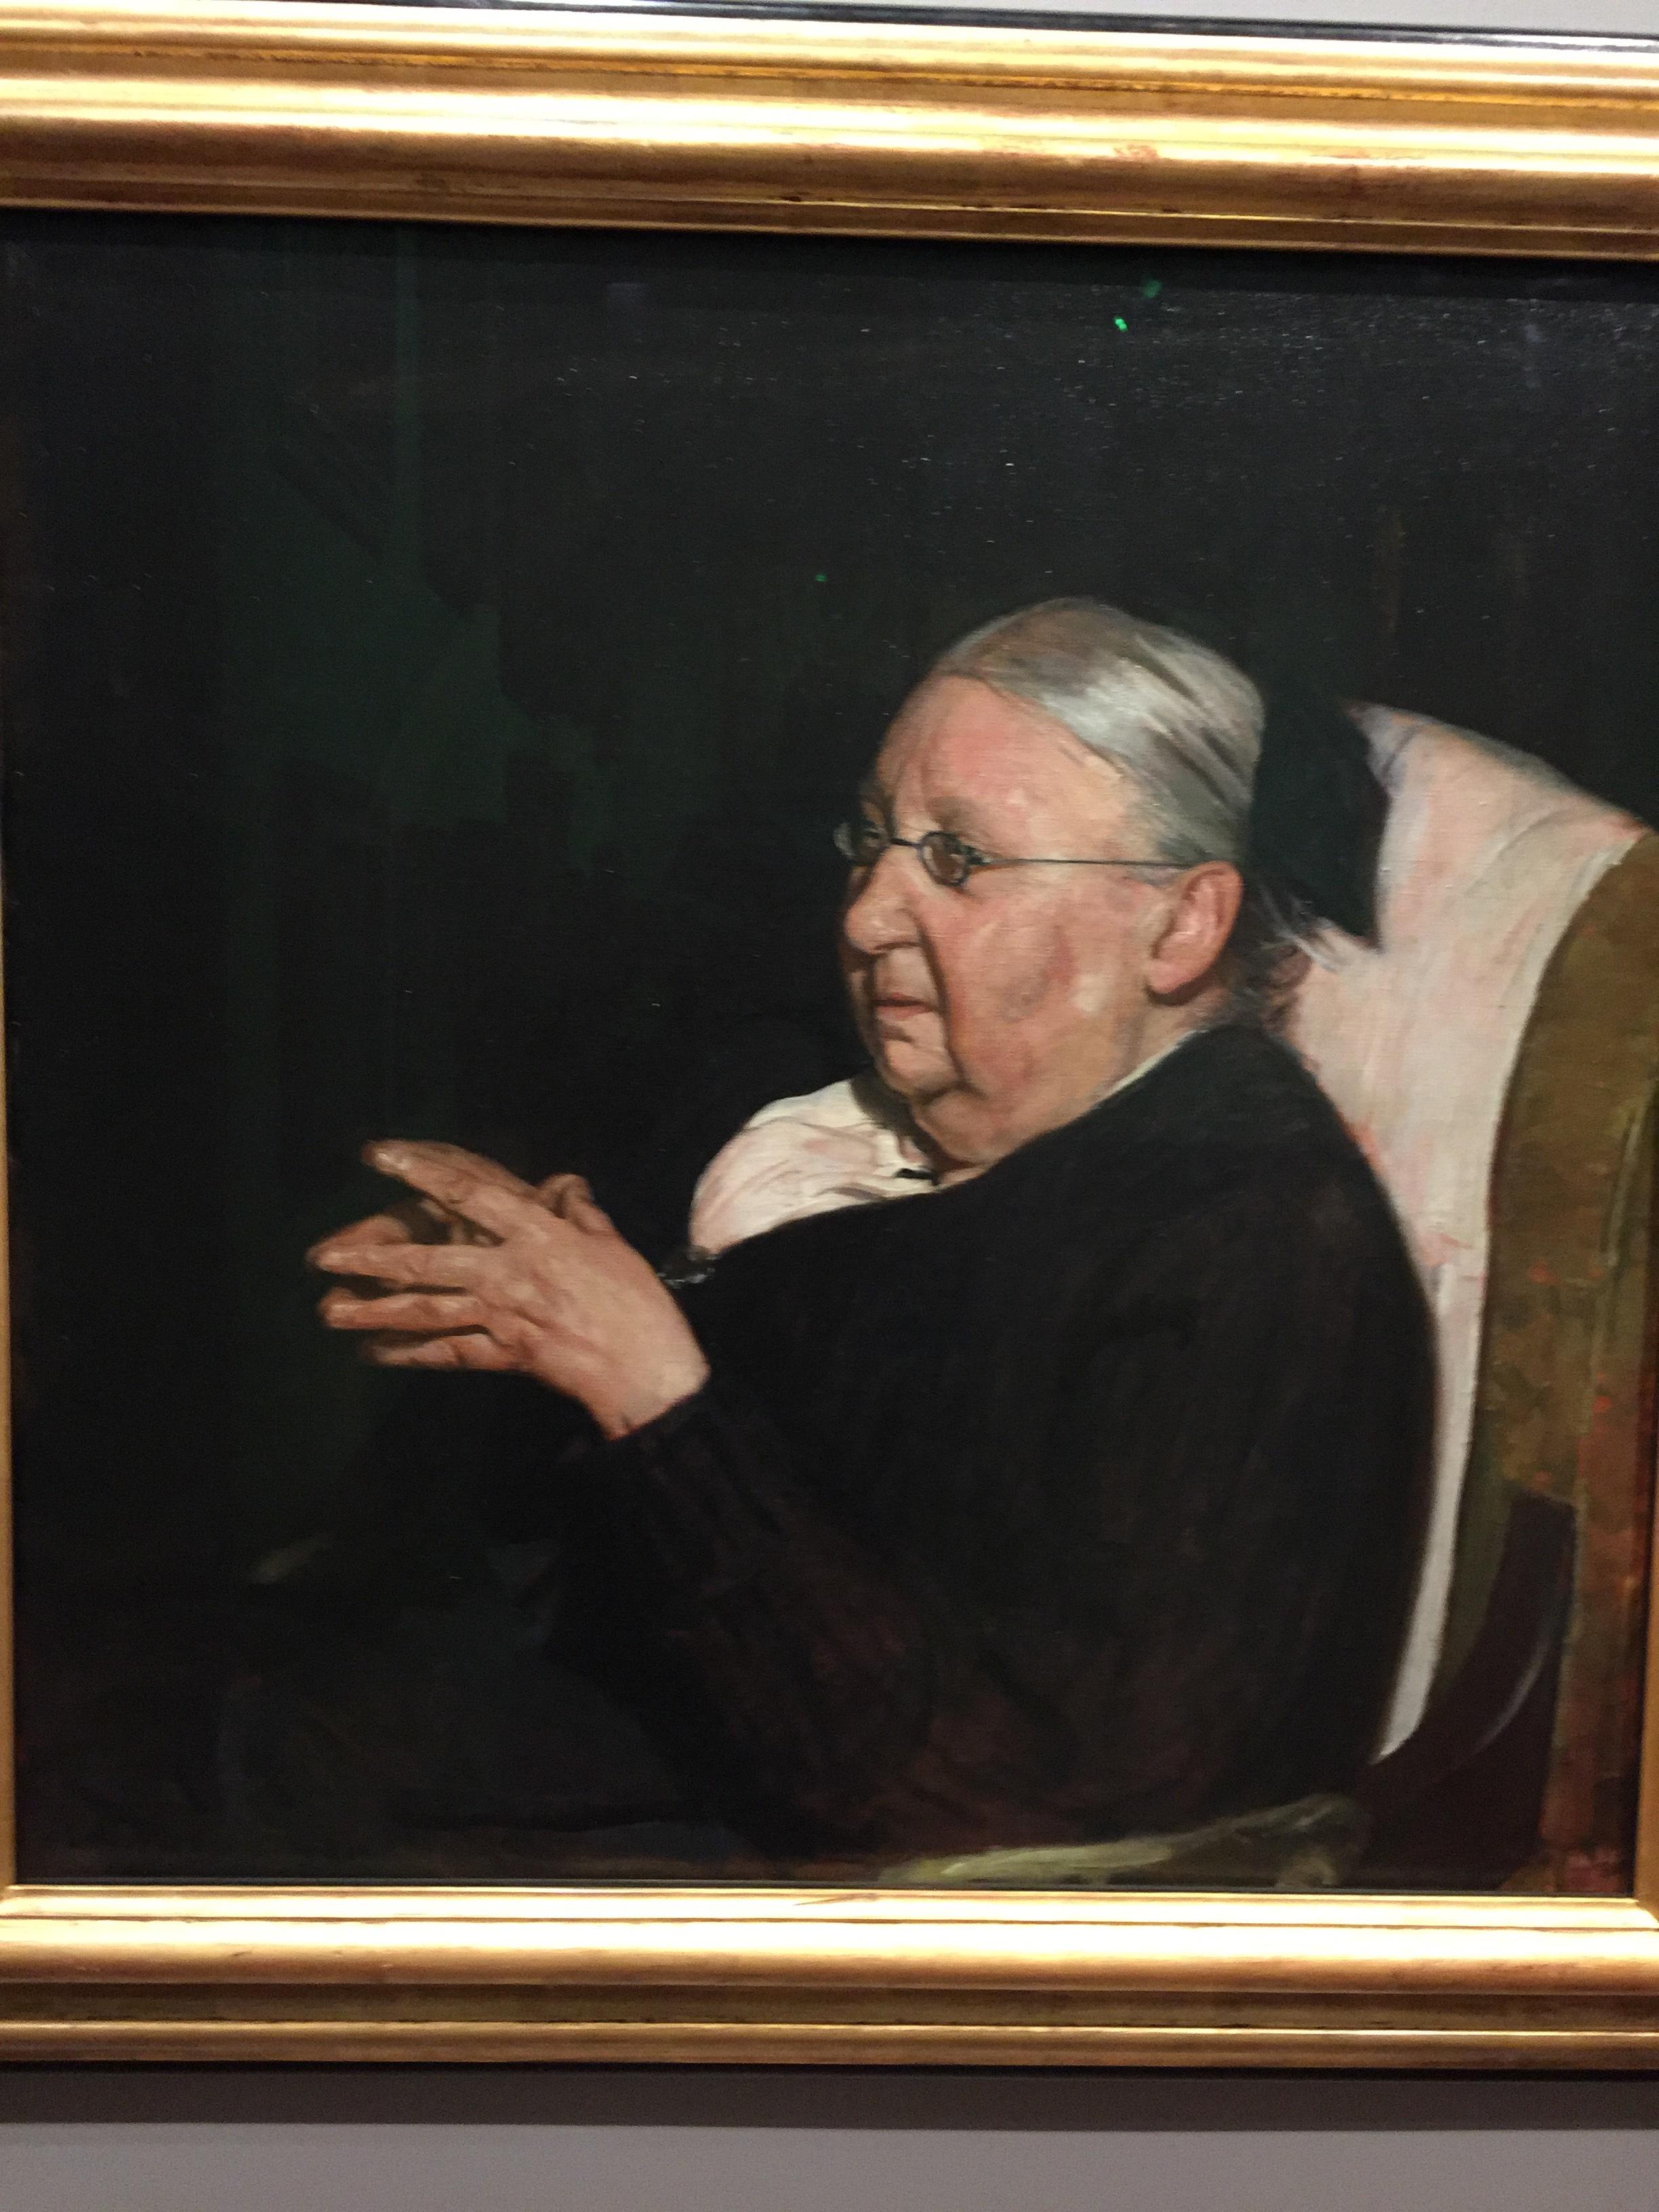 Gertrude Jeckyll